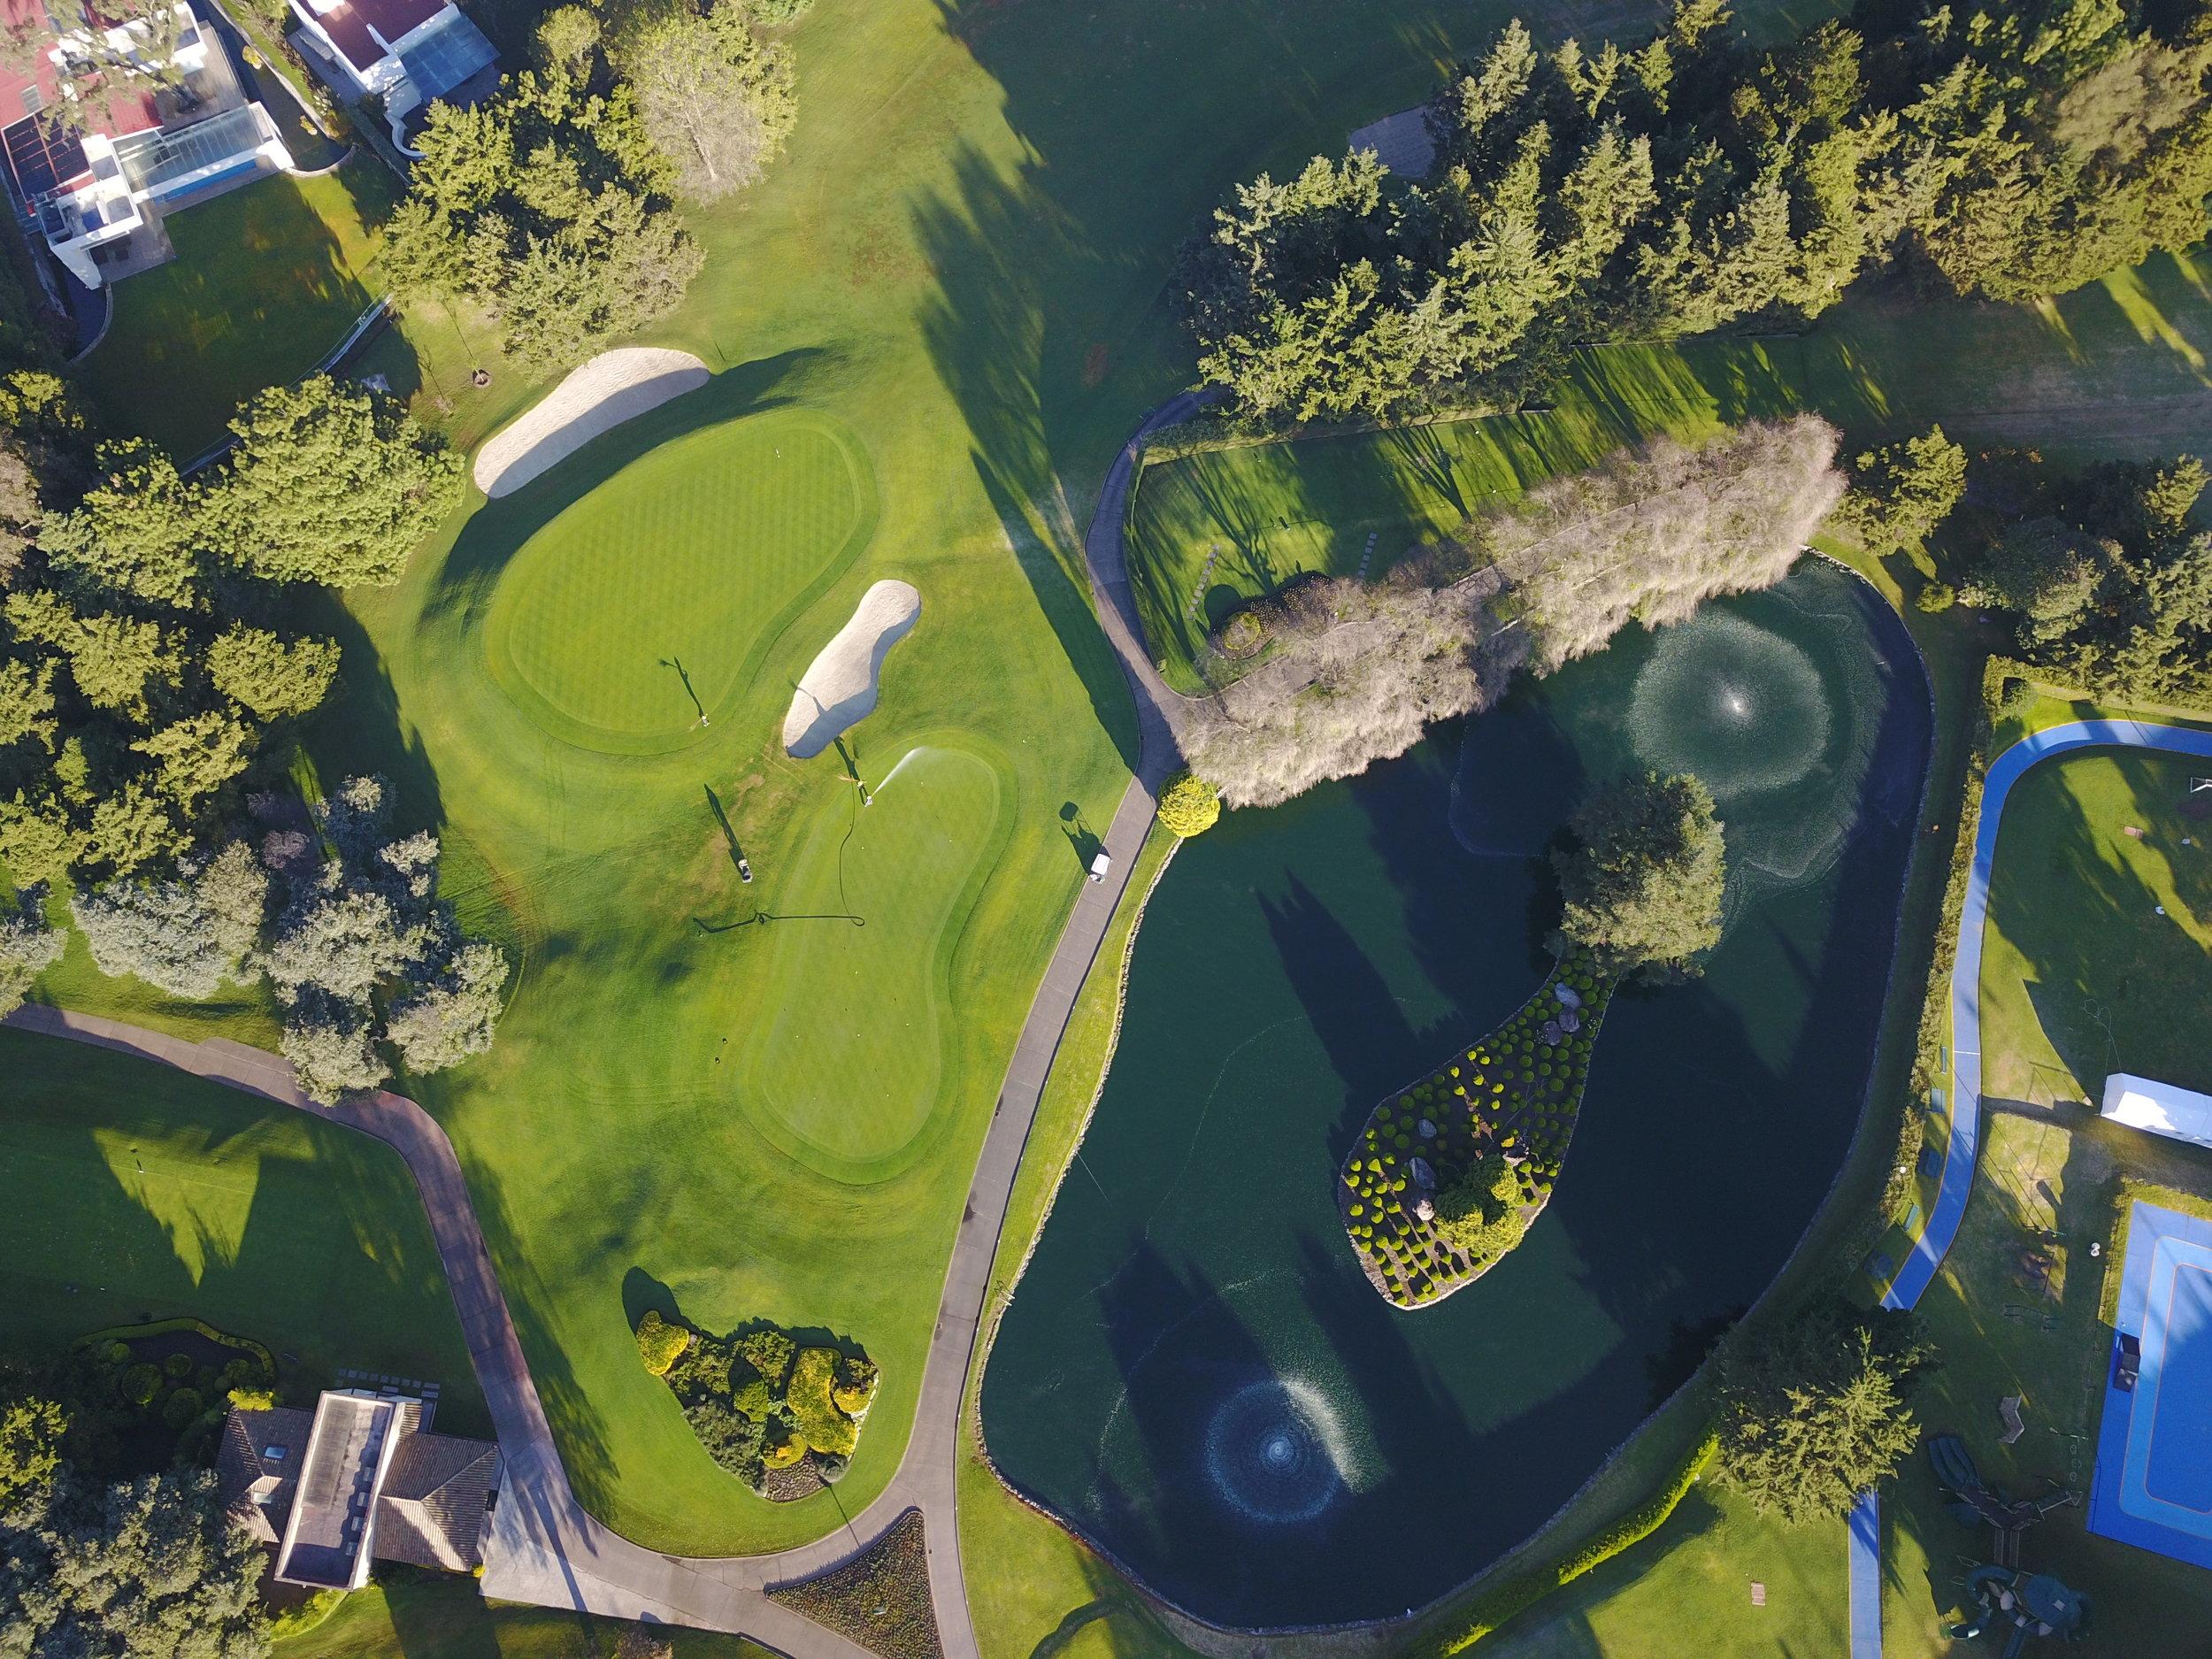 club de golf encinos golfing mexico tour amateur